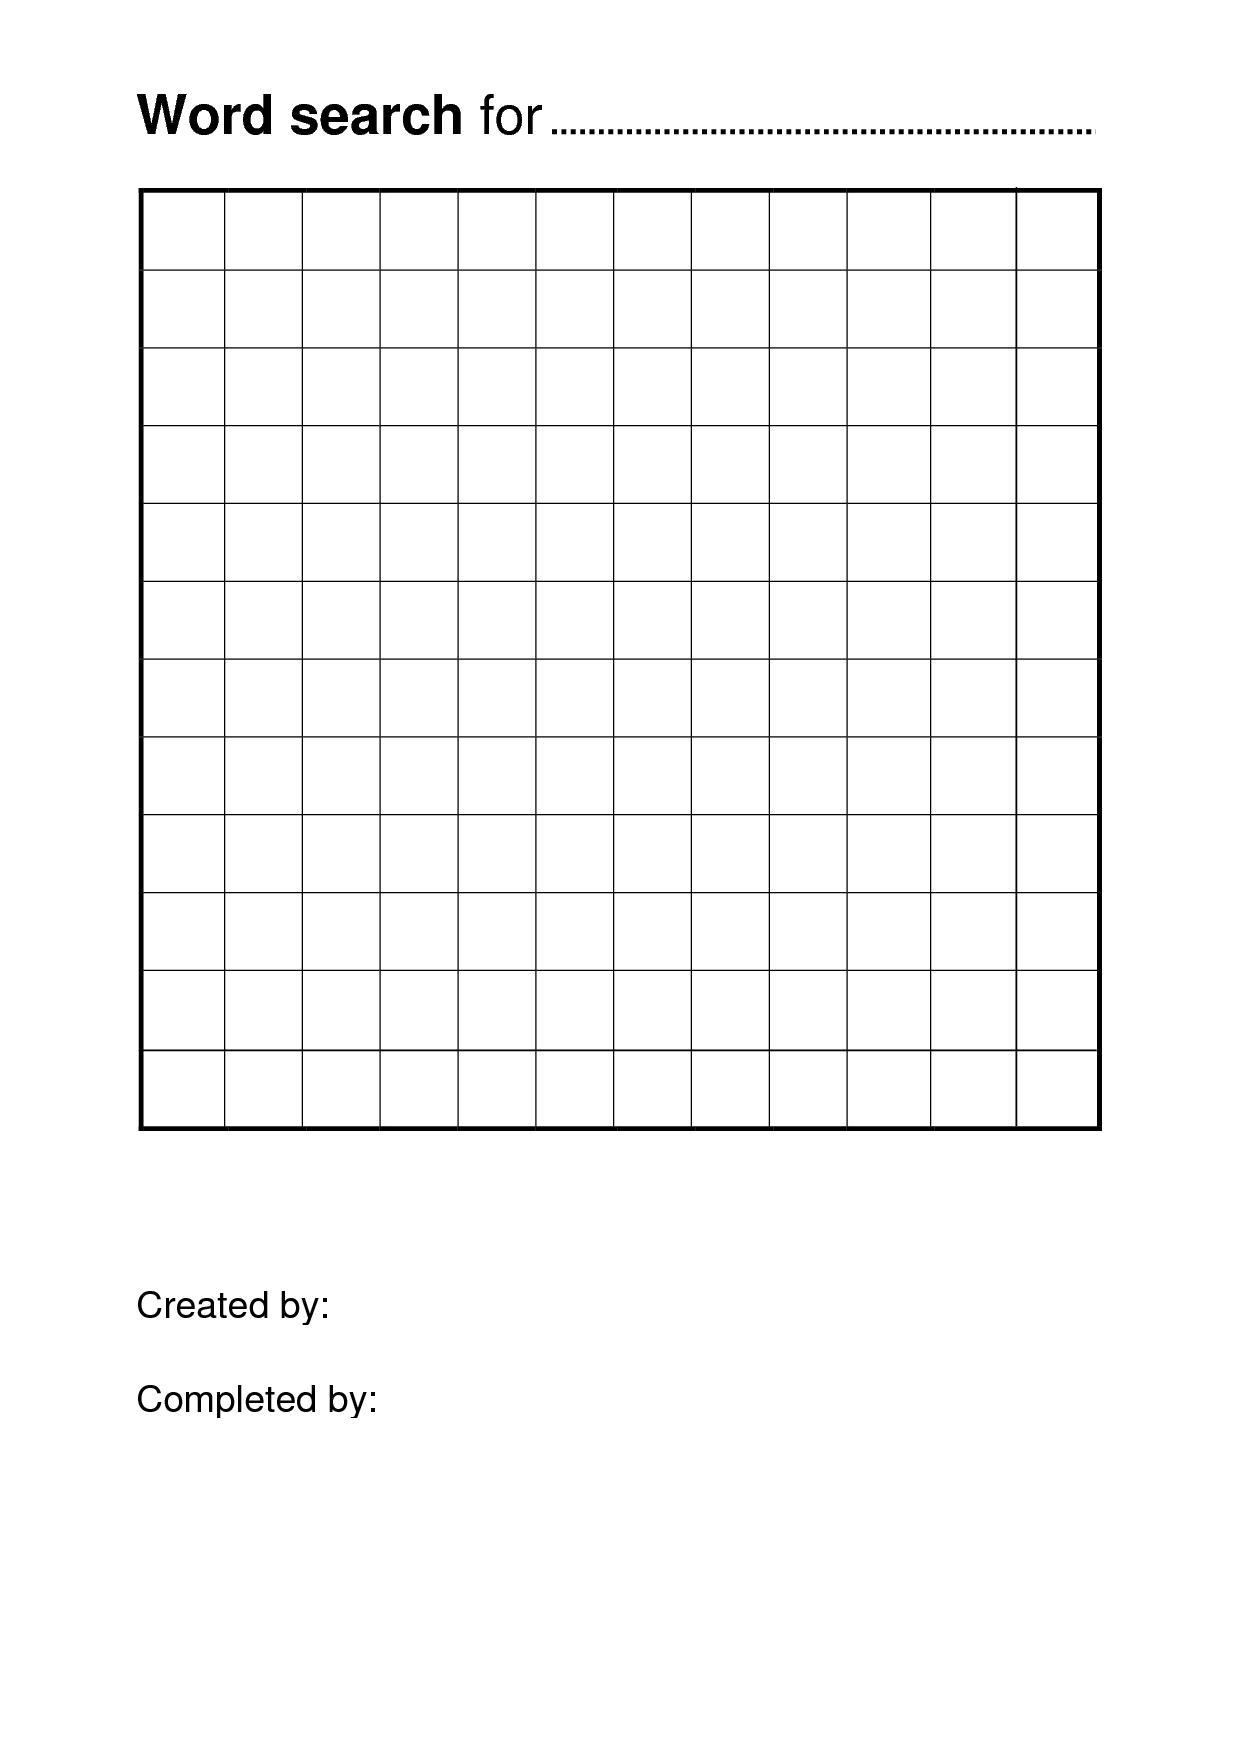 Blank Crossword Template. Blank Crossword Puzzle Clues Template - Printable Blank Crossword Puzzle Template